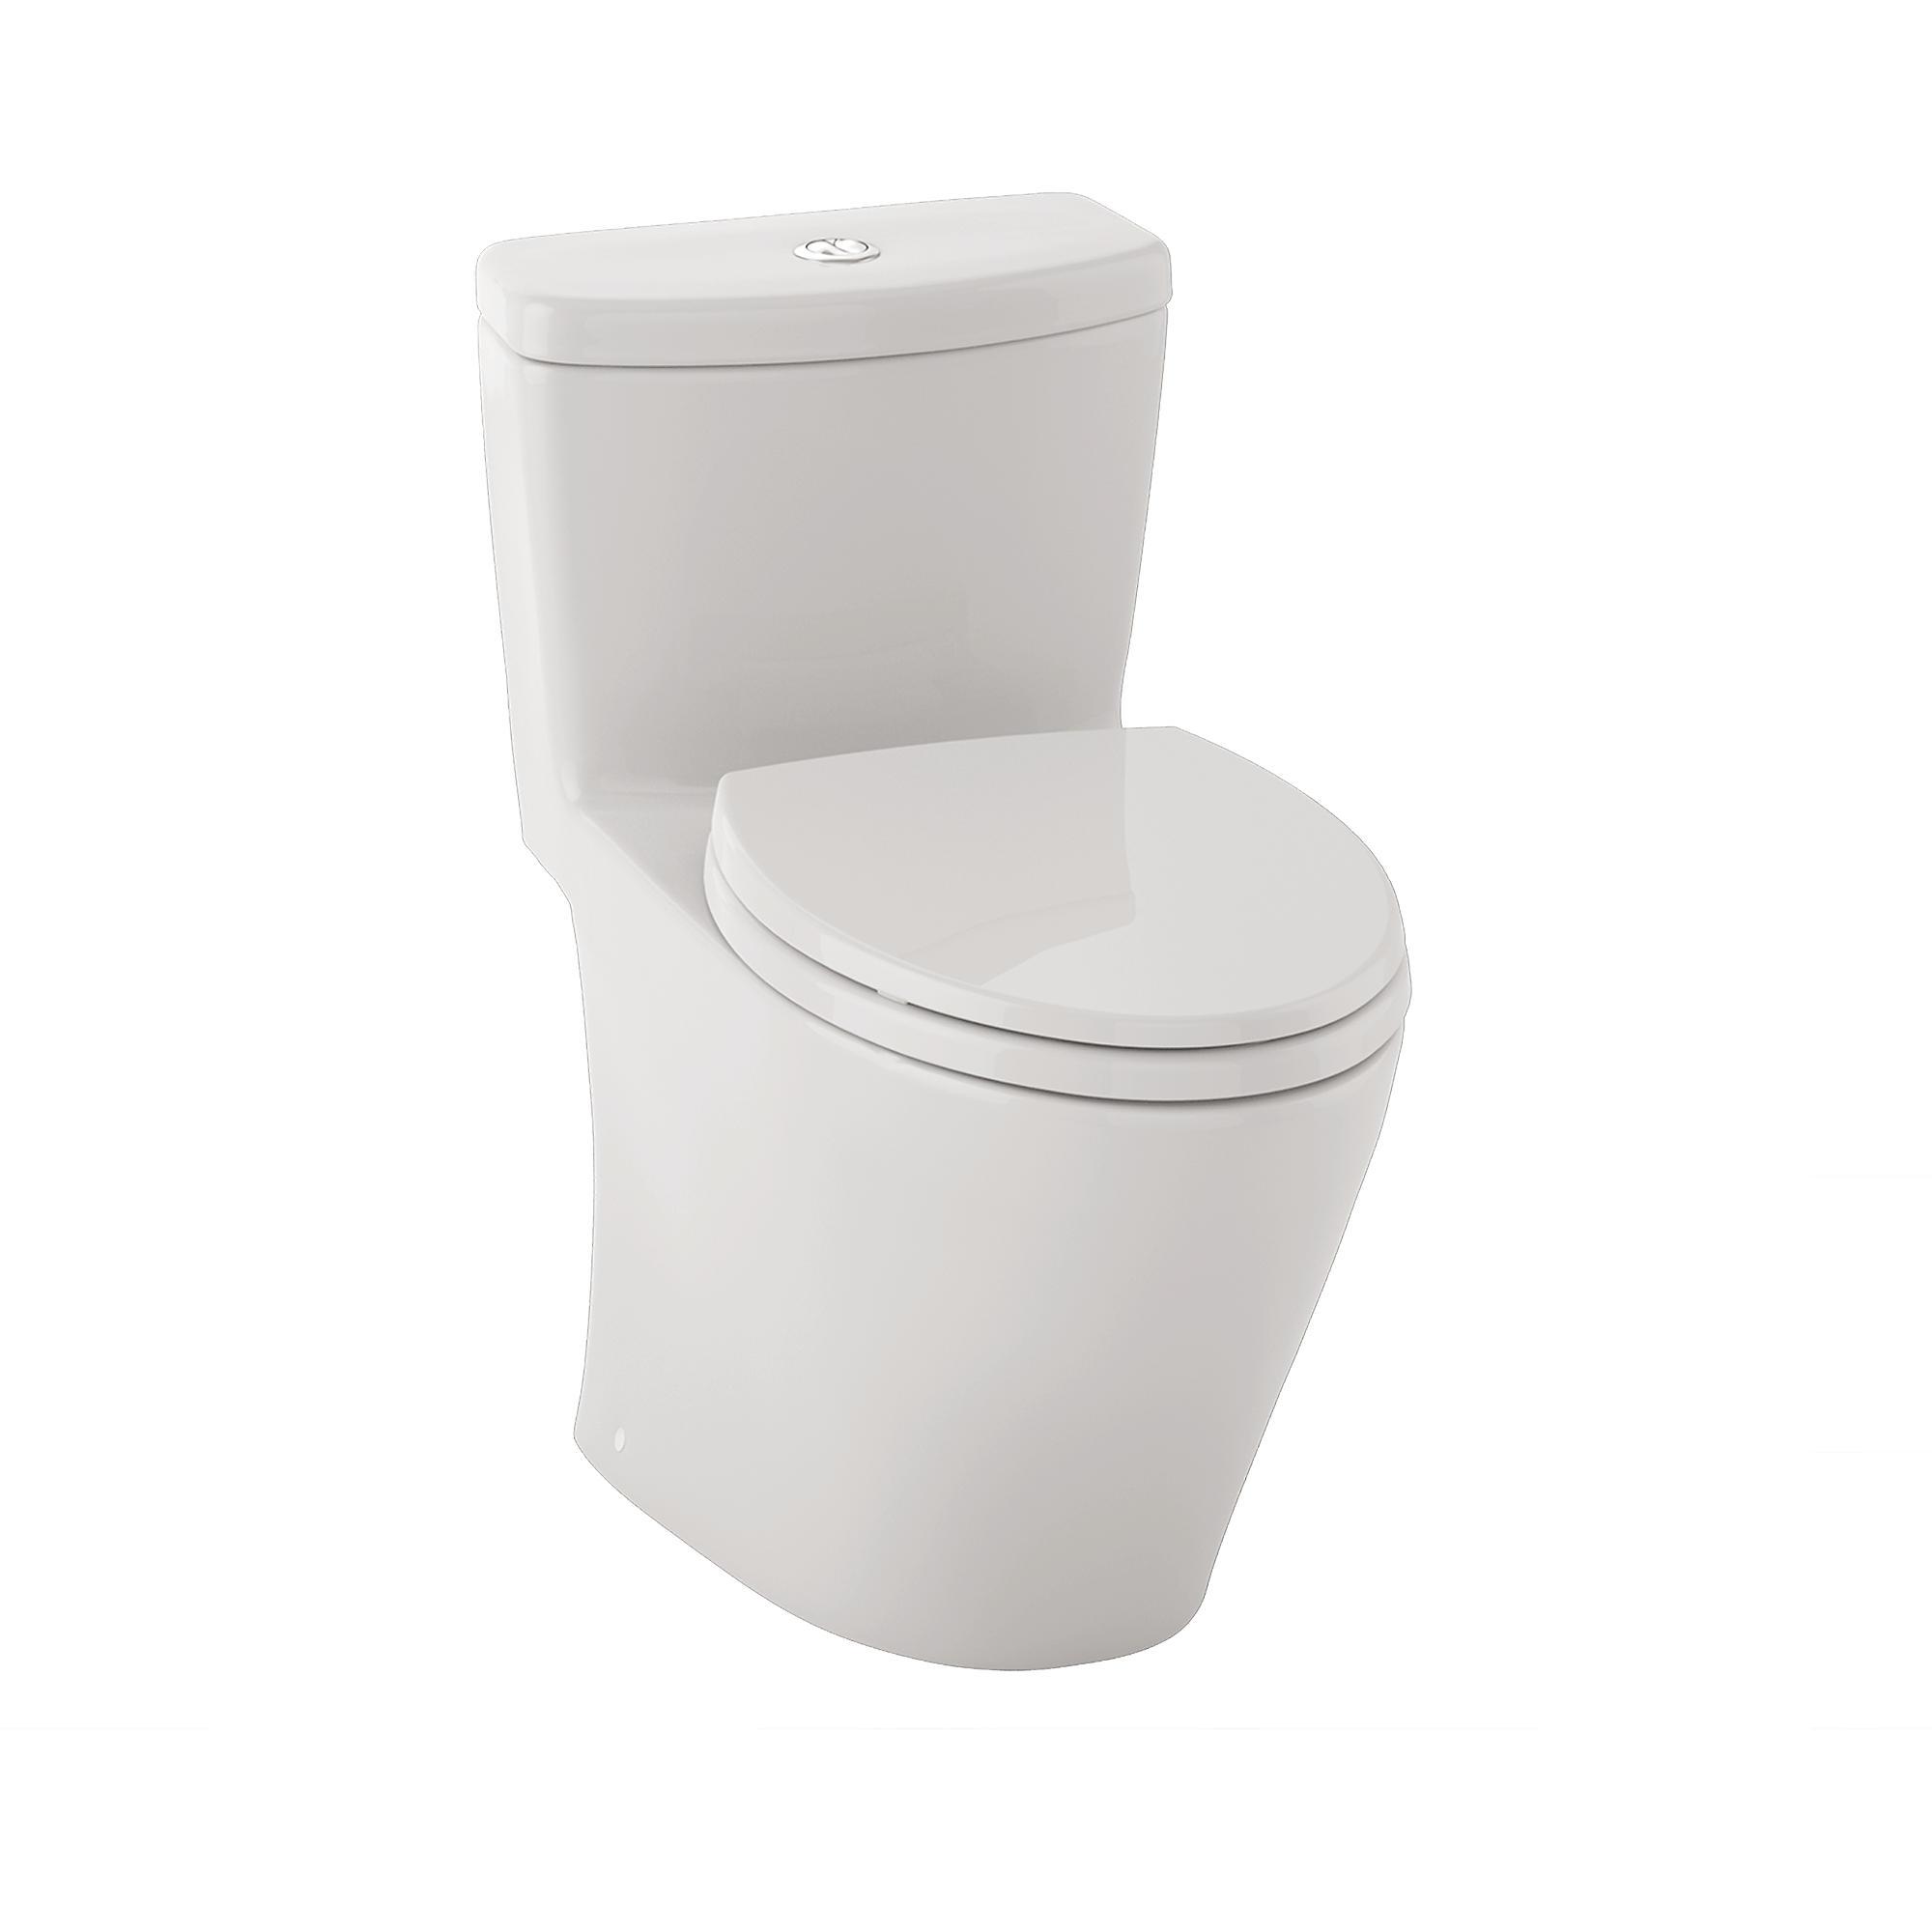 Ms654114mf 01 aquia  one piece toilet  1 6 gpf   0 9 gpf  elongated bowl 0